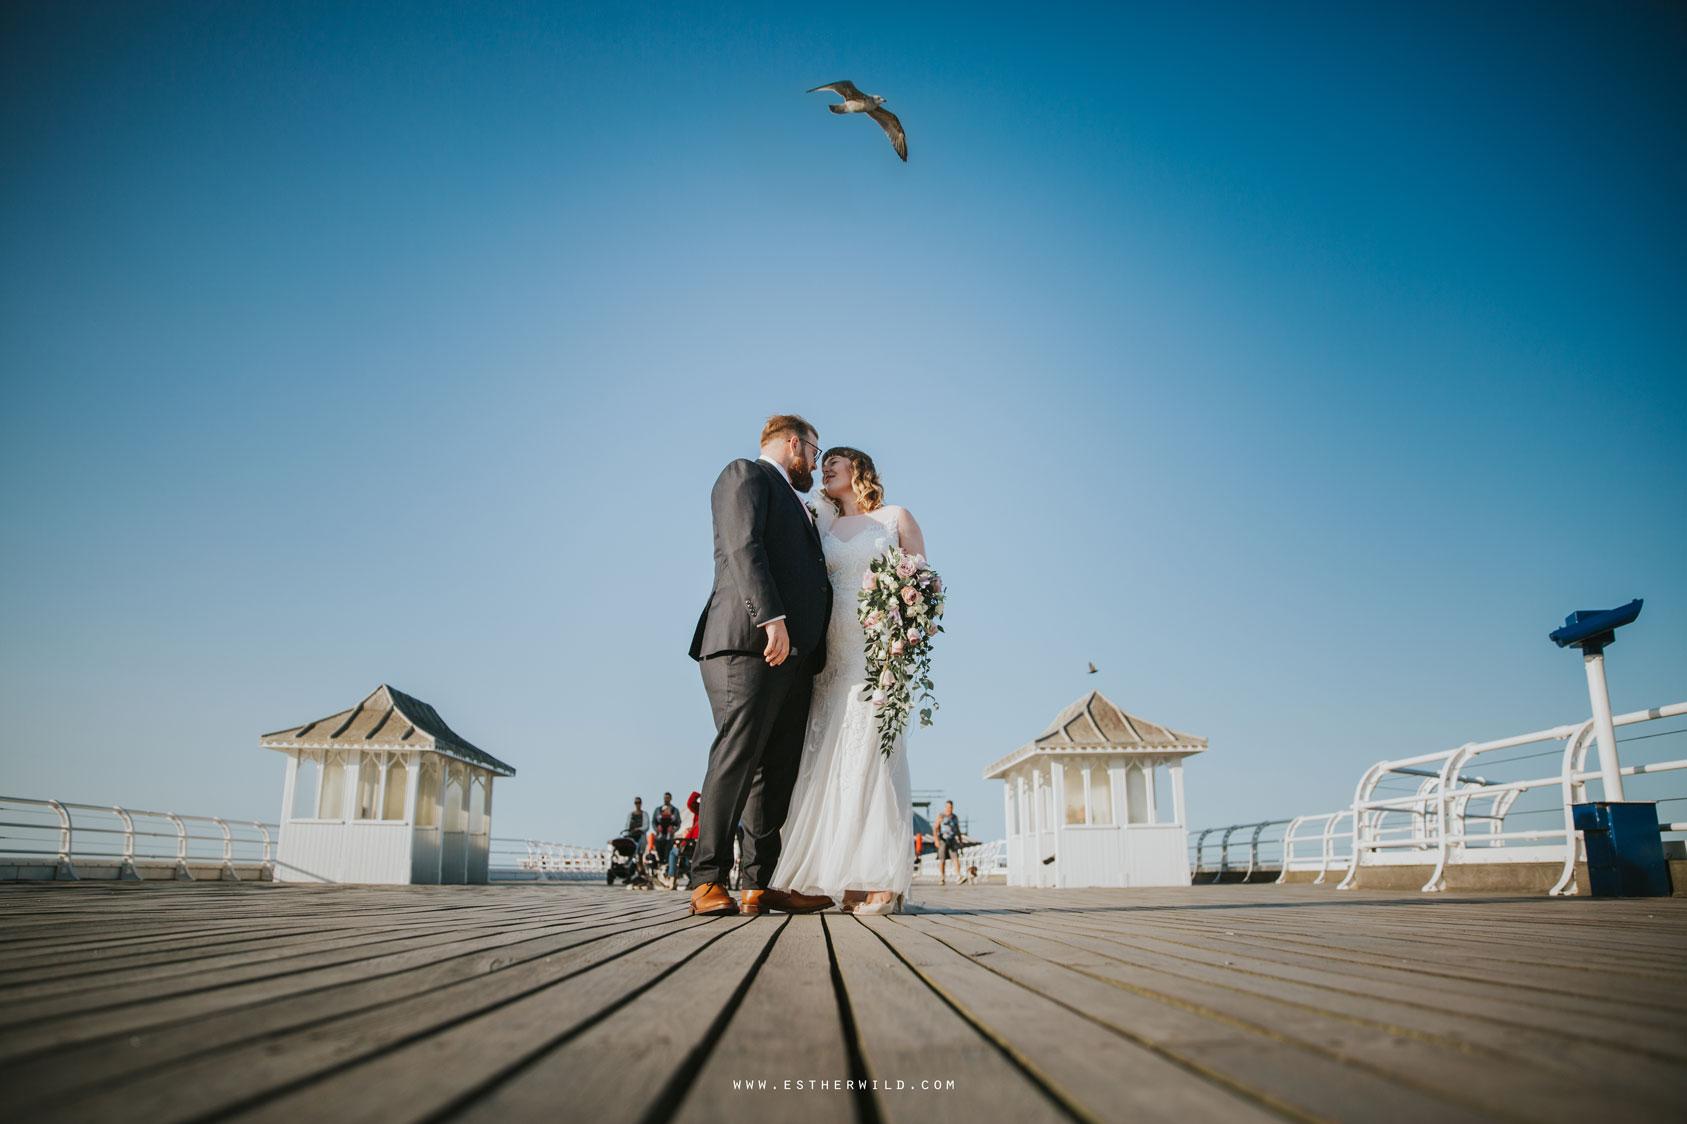 Cromer_Wedding_Beach_Outdoor_Ceremony_Norfolk_North_Lodge_Registry_Office_Rocket_House_Cafe_Cromer_Pier_IMG_4599_IMGL8388.jpg